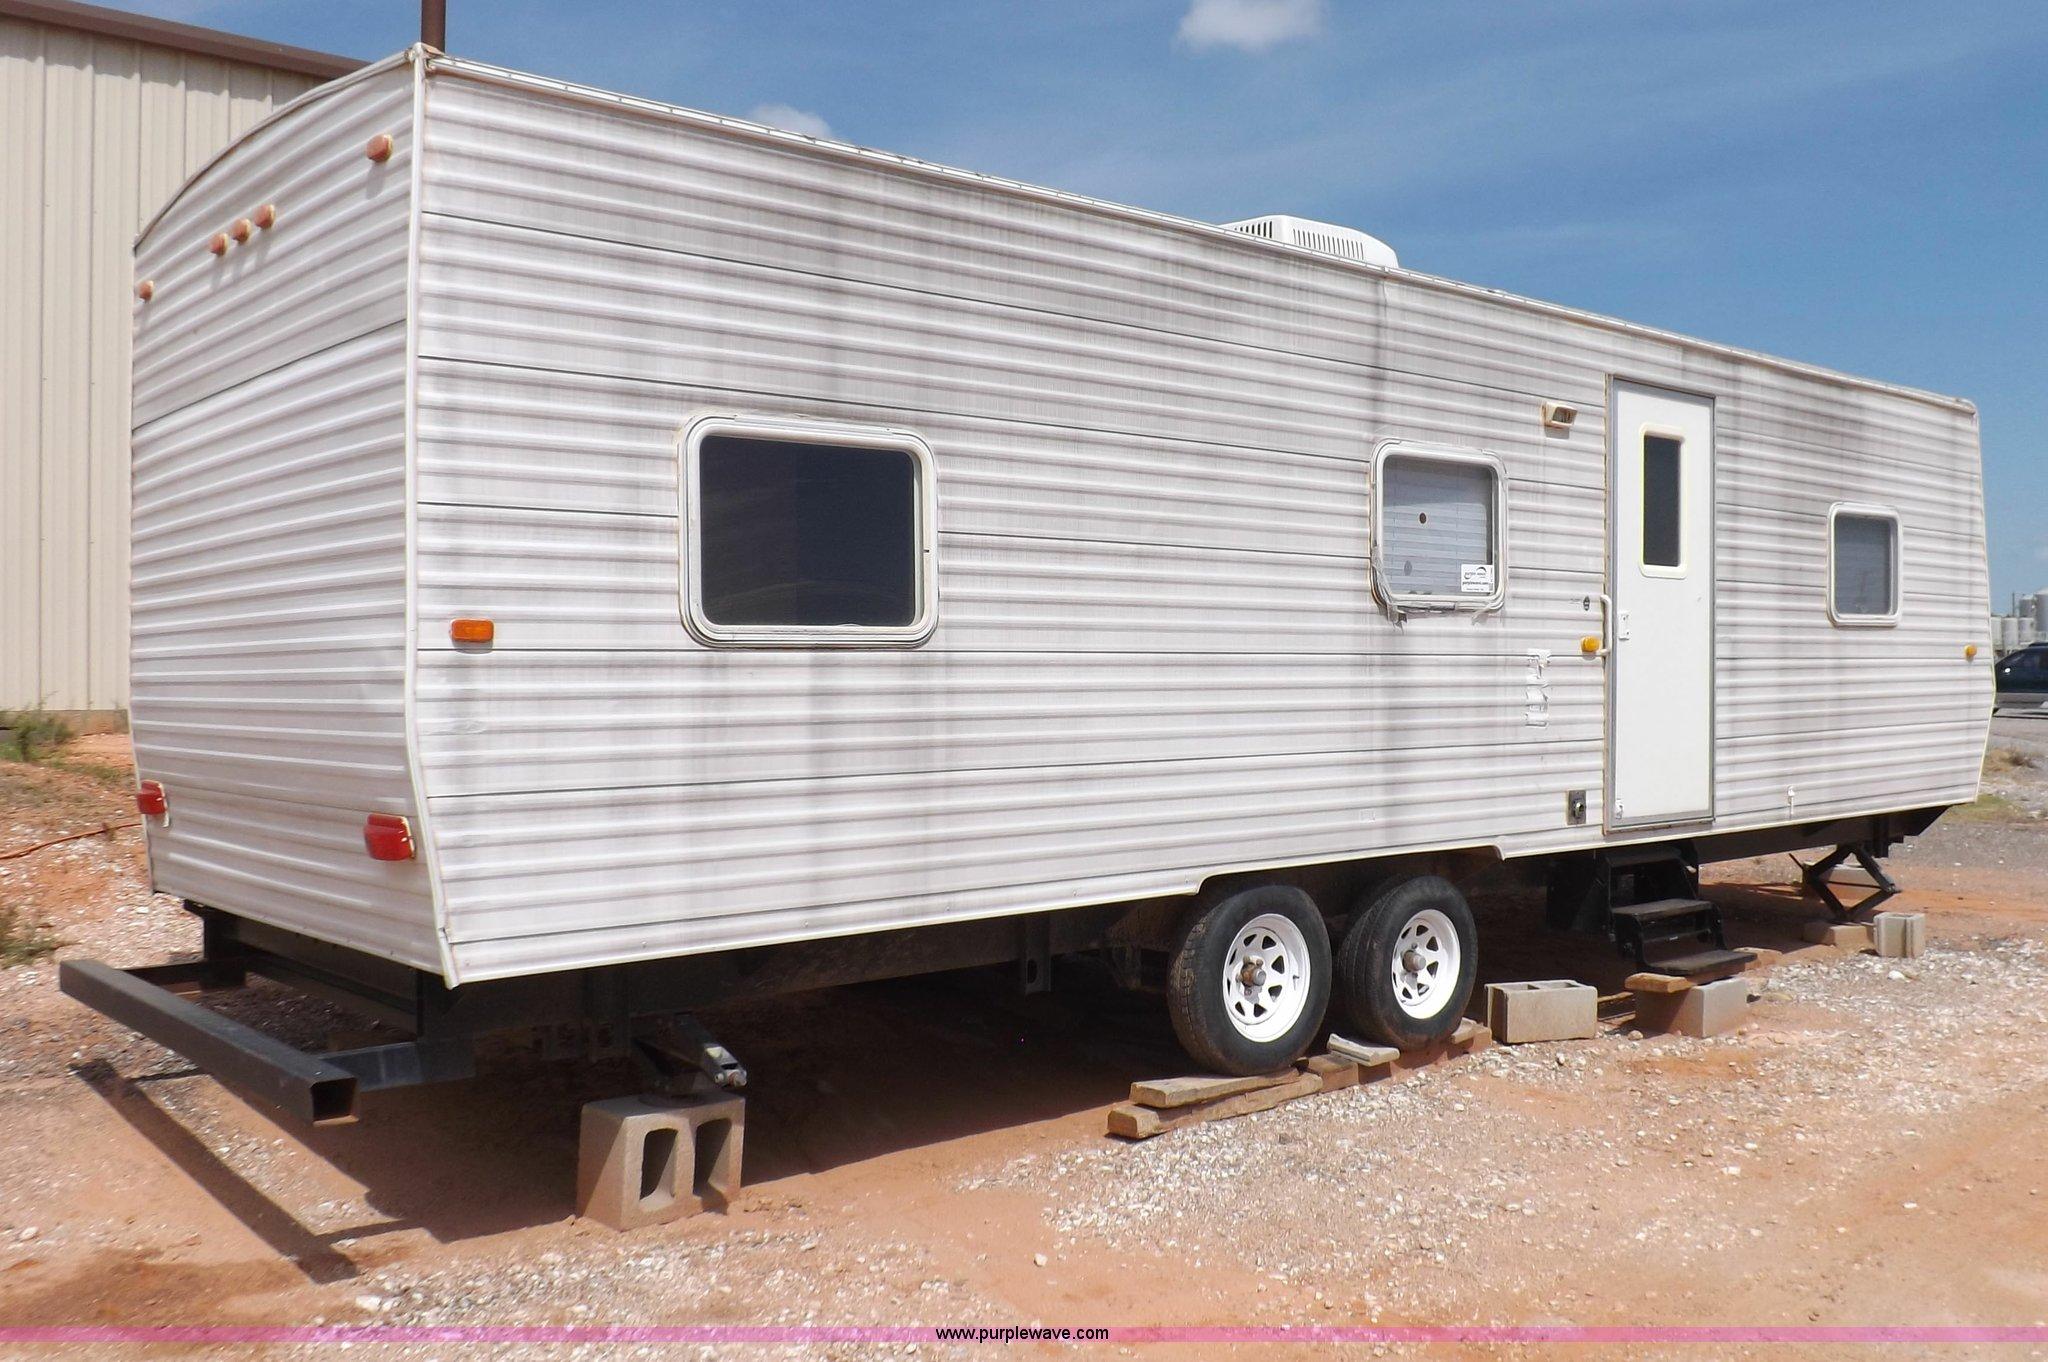 ... Gulfstream Cavalier camper Full size in new window ...